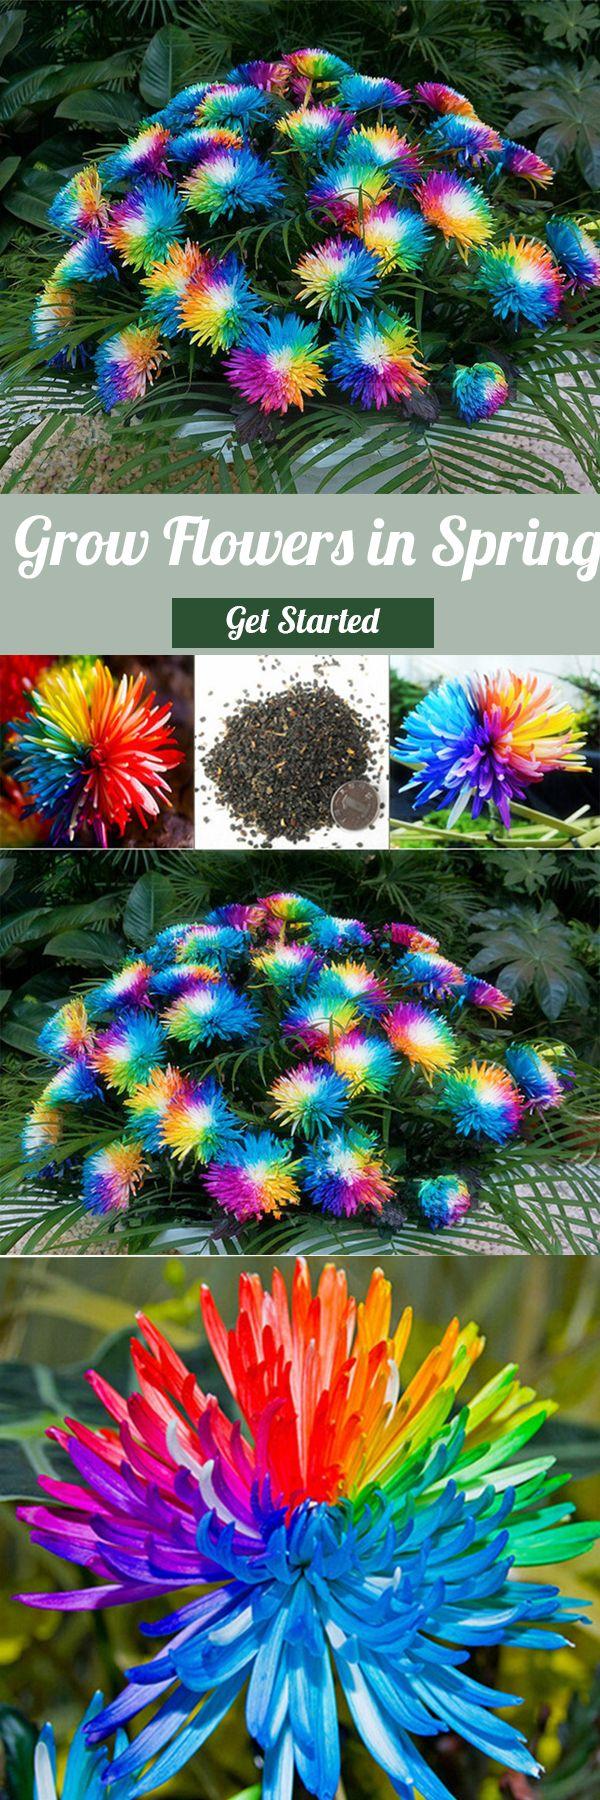 Pcs rainbow chrysanthemum flower seeds magic garden rare color